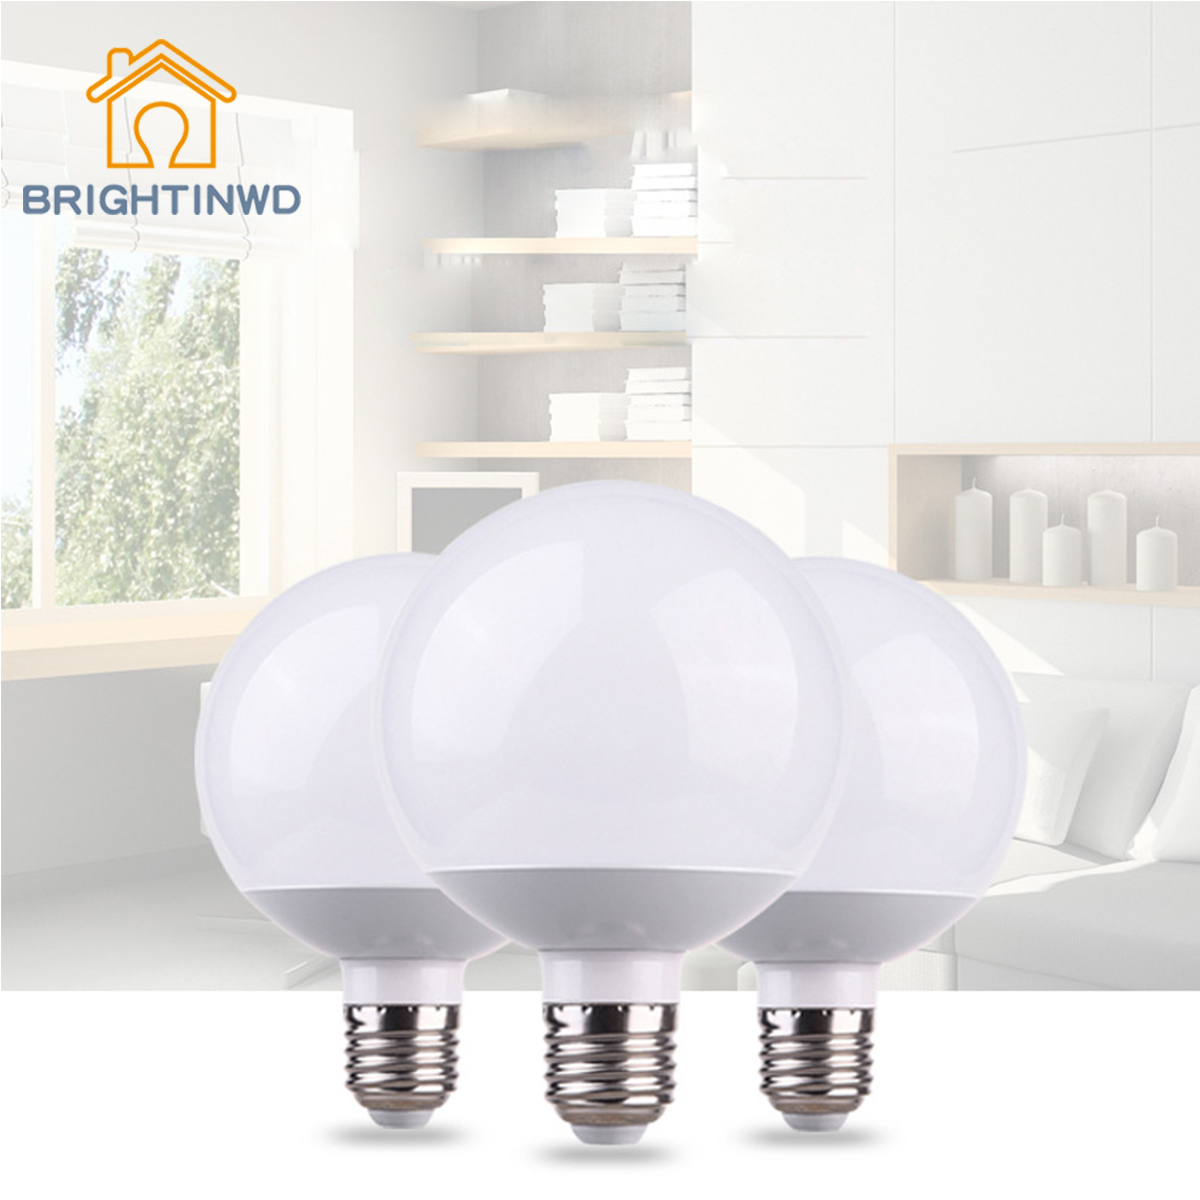 BRIGHTINWD LED G80 Bulb E27 Screw Photography Studio Dresser Wedding High power G70G60G95 Bulb